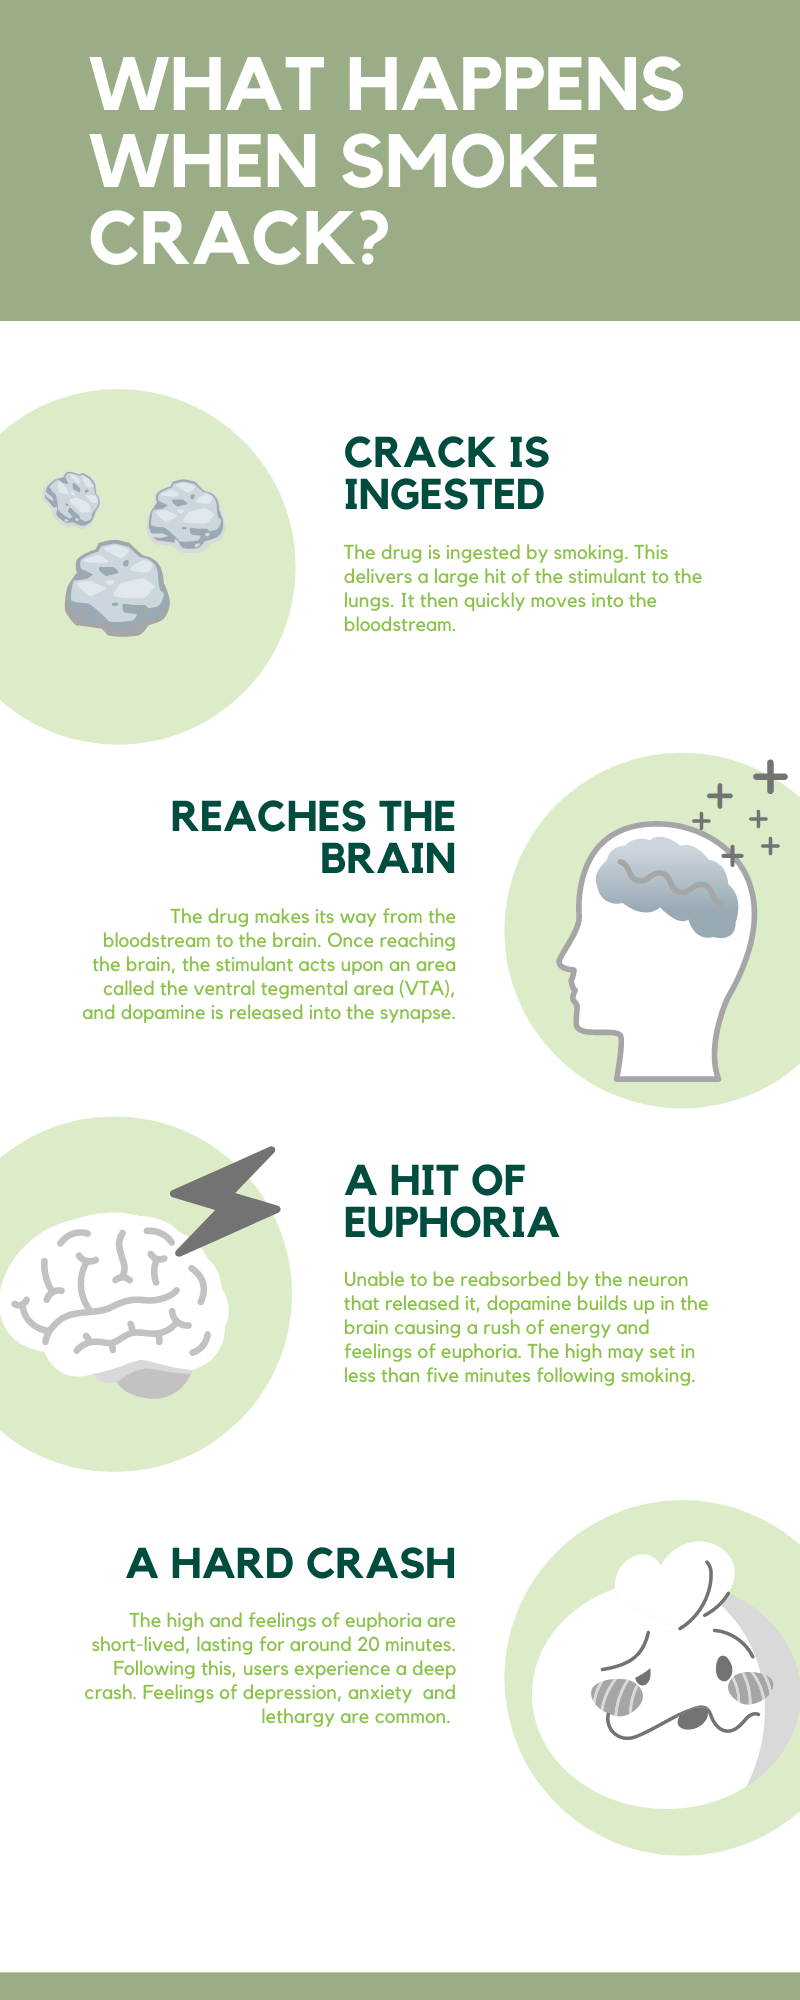 Your brain on crack, crack cocaine, brain, effects of crack cocaine on the brain, what does crack do to your brain